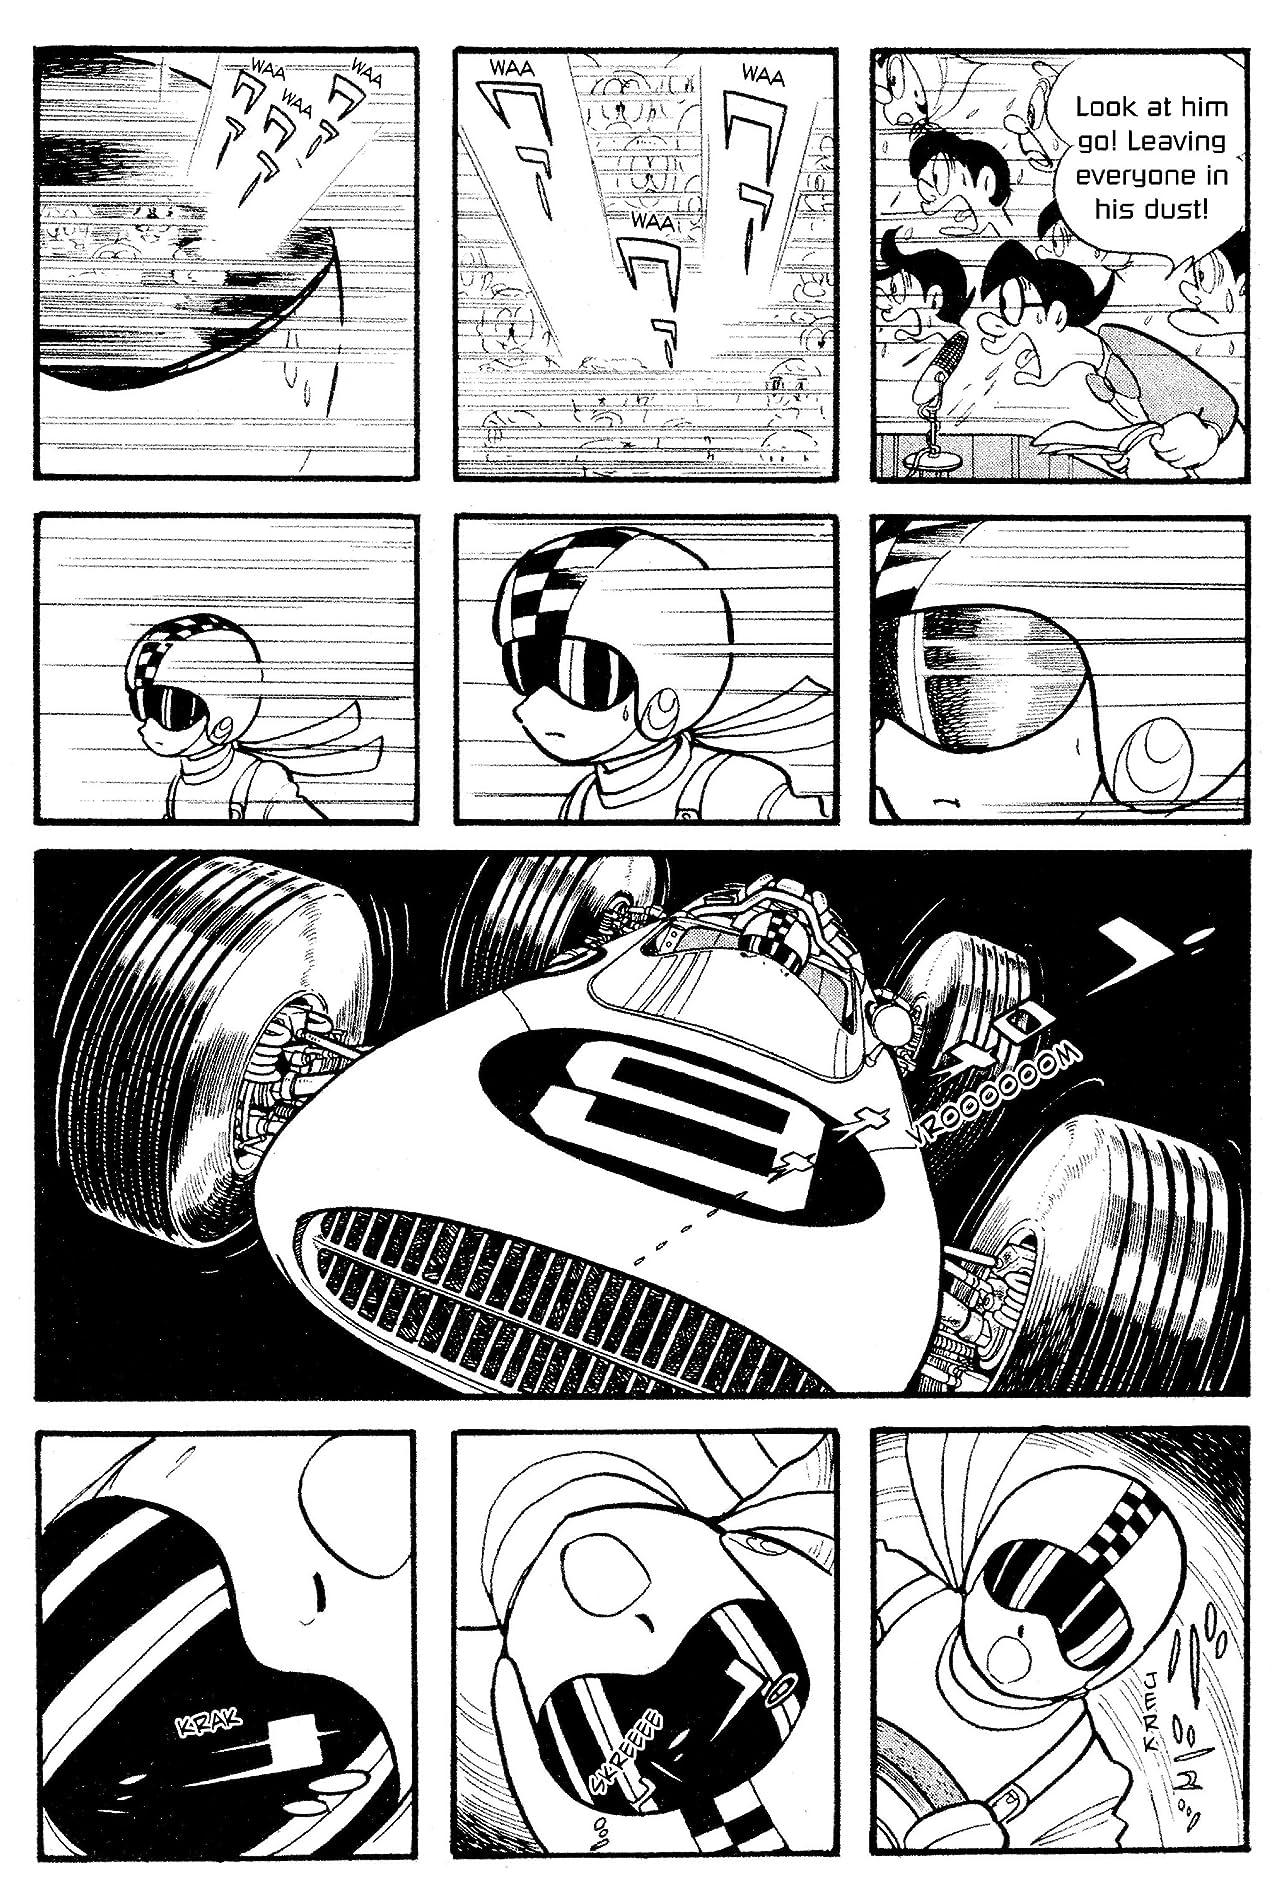 Cyborg 009 Vol. 8